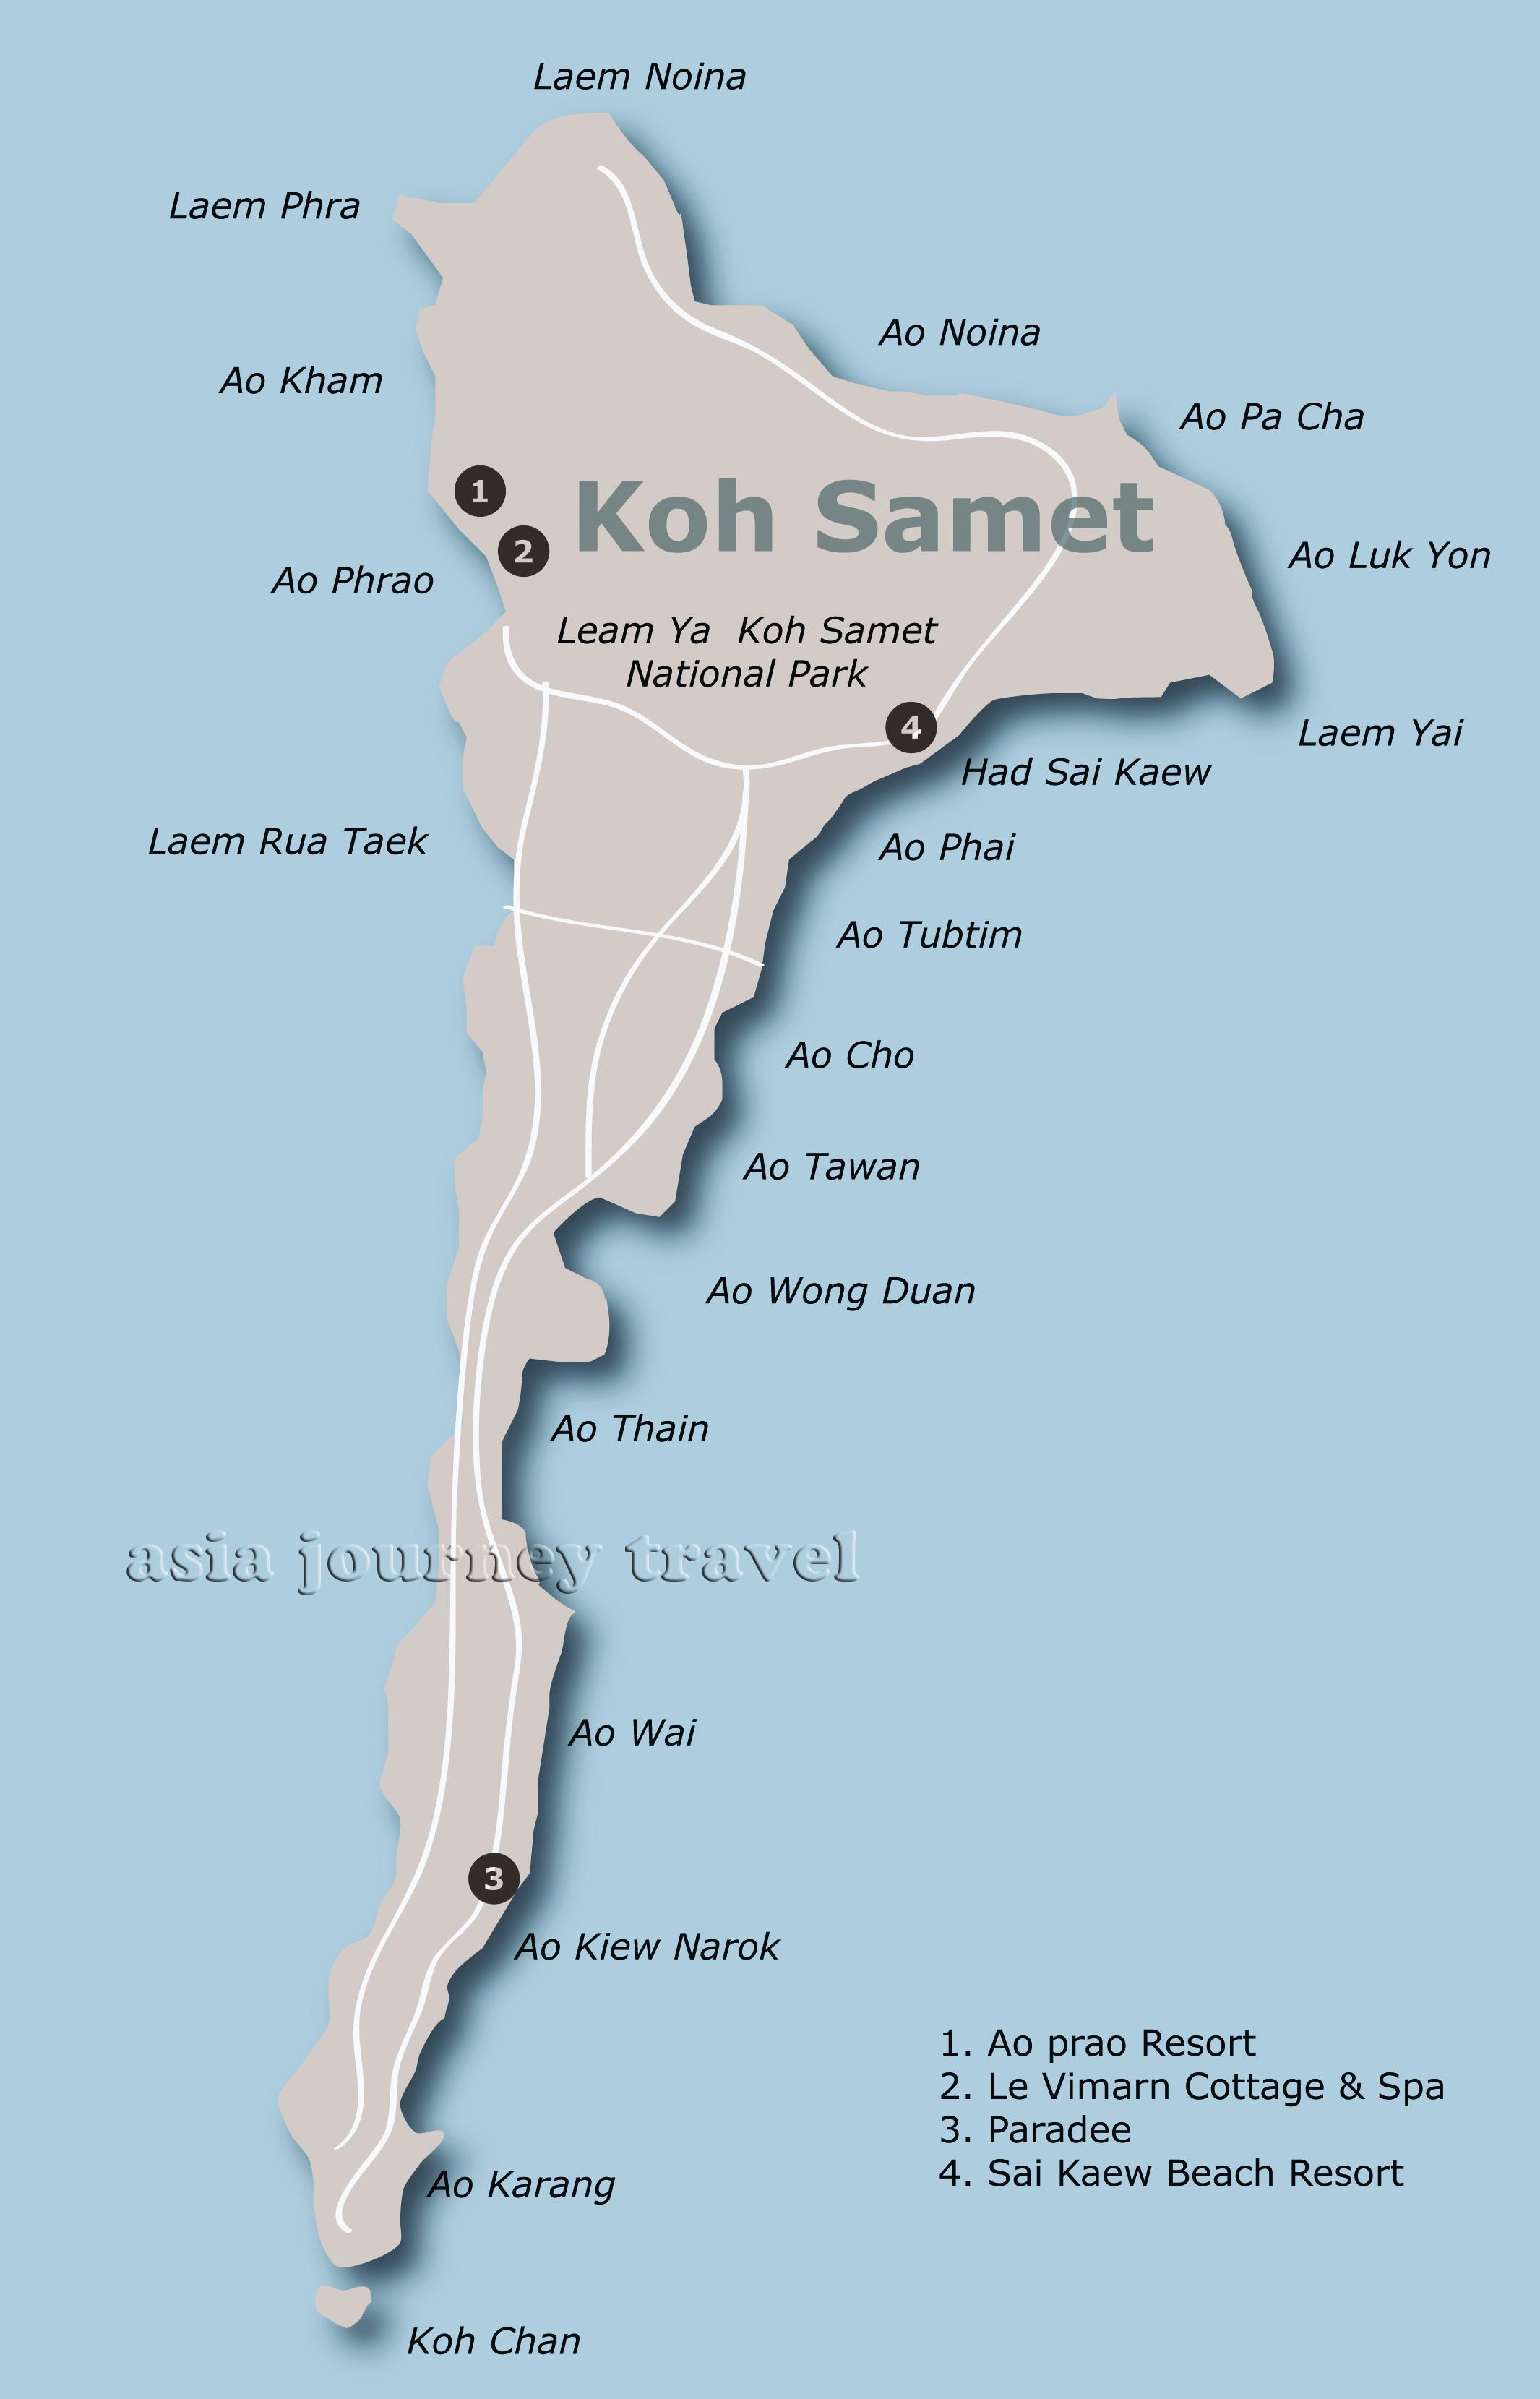 Rayong Koh Samet Asia Journey